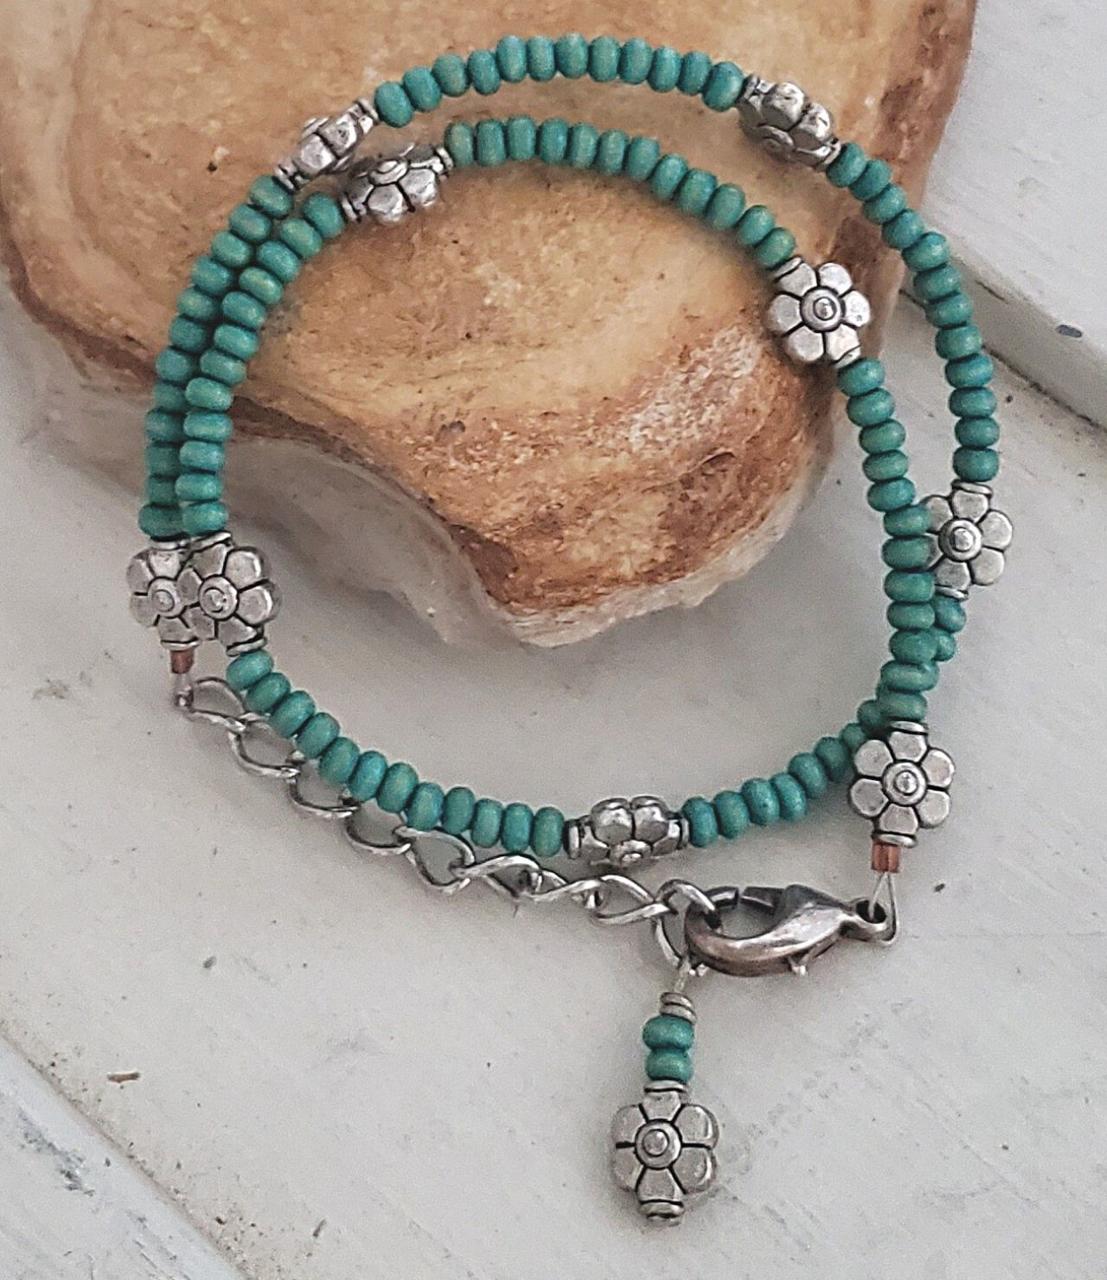 Turquoise wood beads & silver flower bracelet on a rock